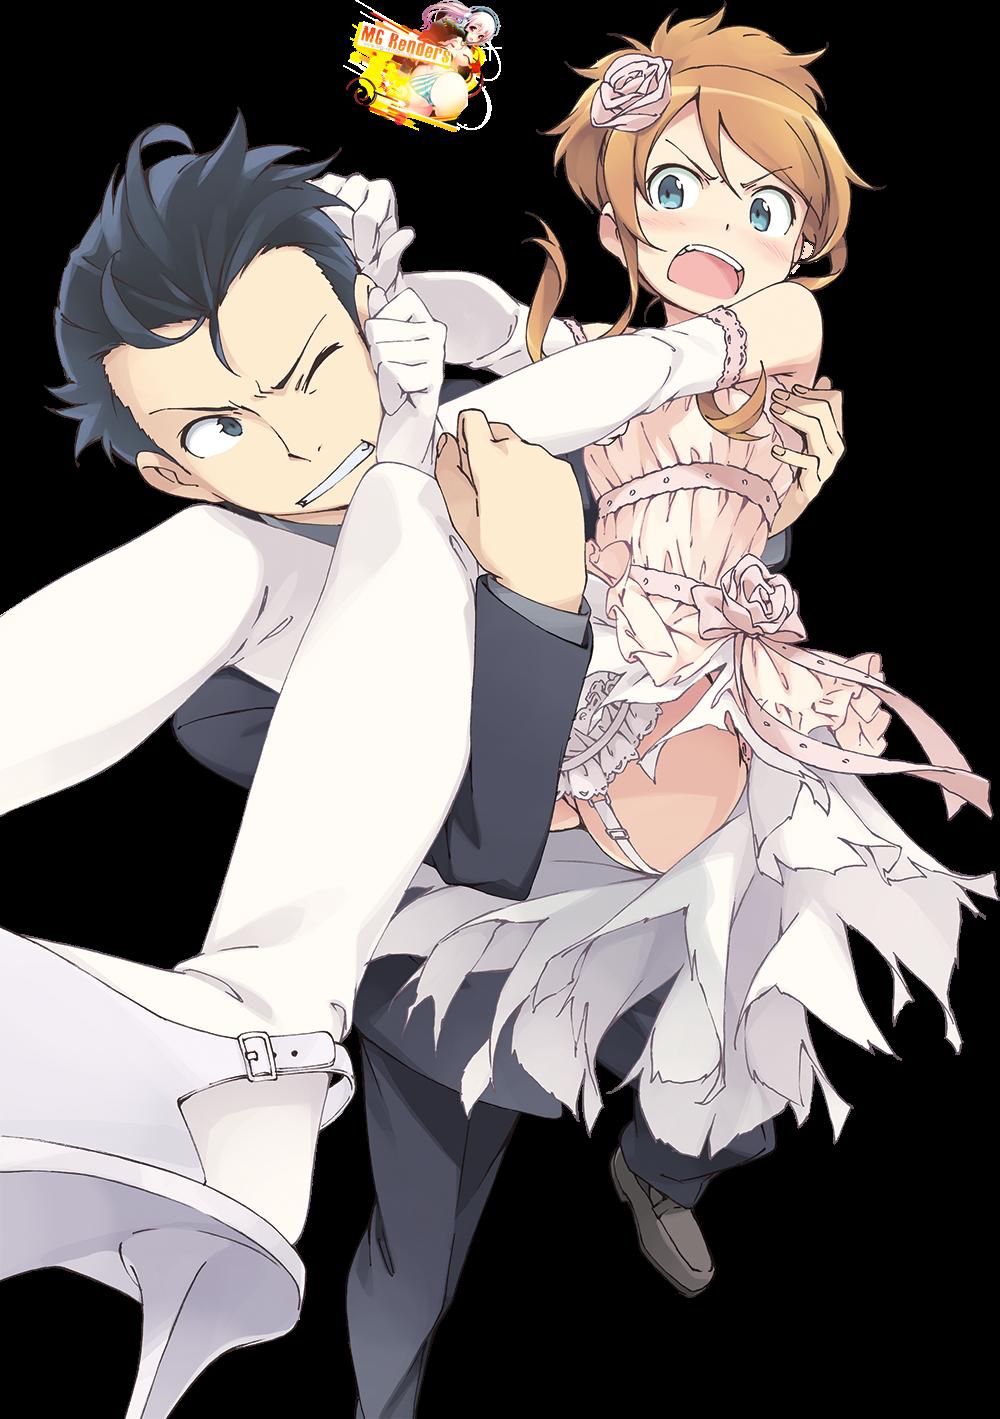 Tags: Anime, Render,  Kousaka Kirino,  Kousaka Kyousuke,  Ore no Imouto ga Konna ni Kawaii Wake ga Nai,  PNG, Image, Picture